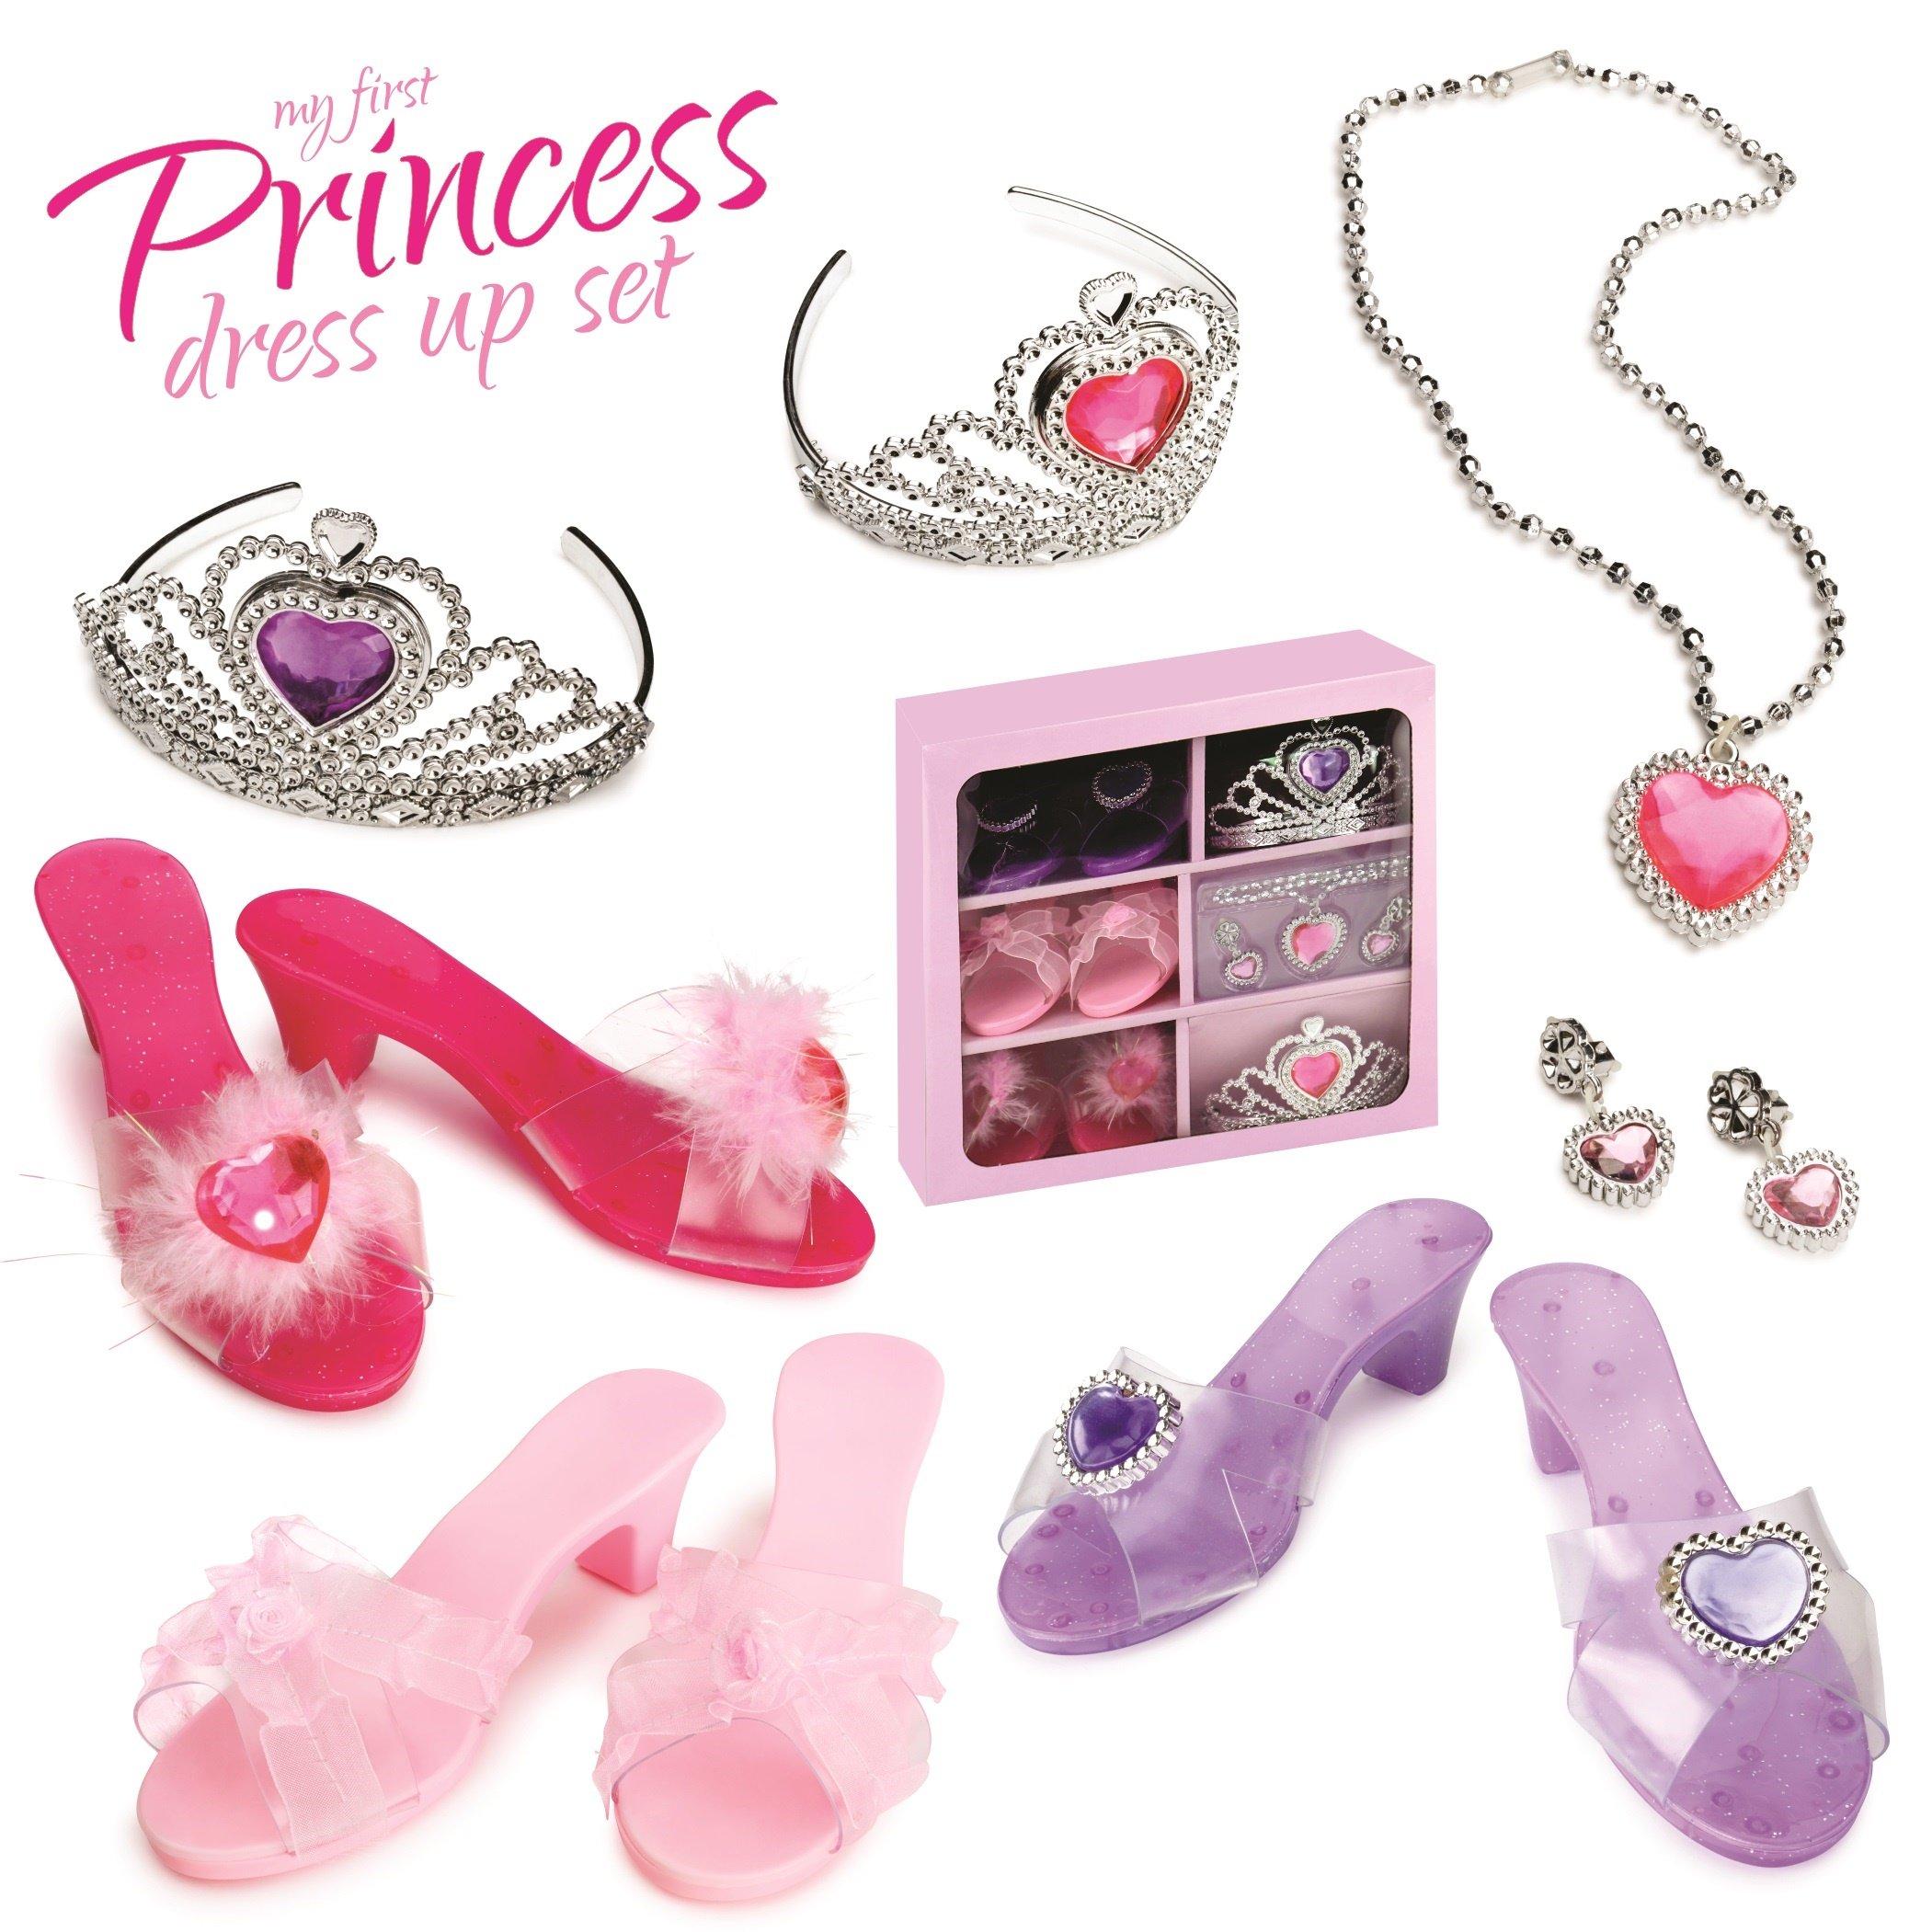 Princess Accessory Dress Up Set